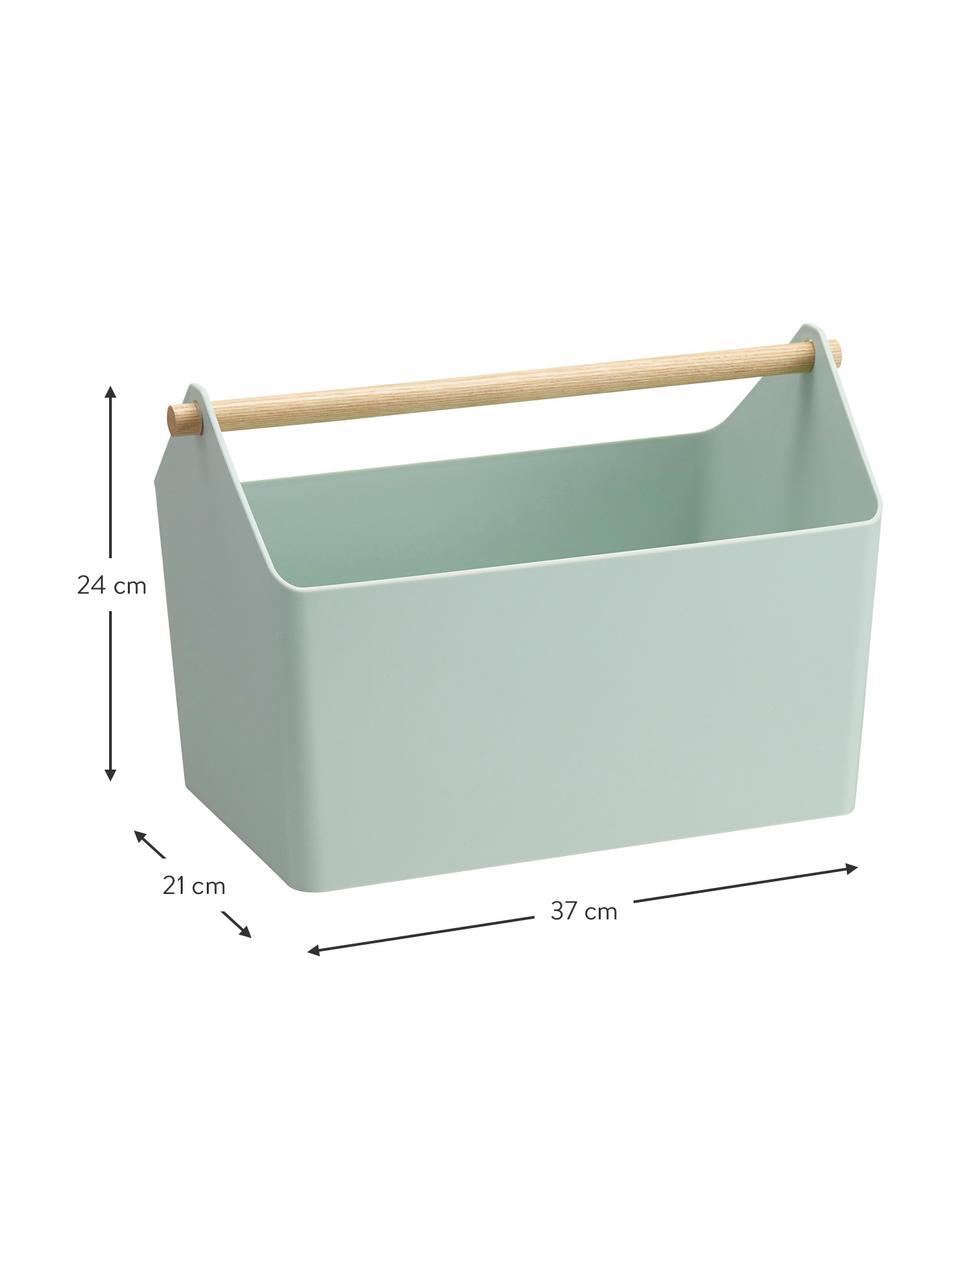 Aufbewahrungskorb Favori, Korb: Polypropylen, Griff: Holz, Mintgrün, Braun, 37 x 24 cm